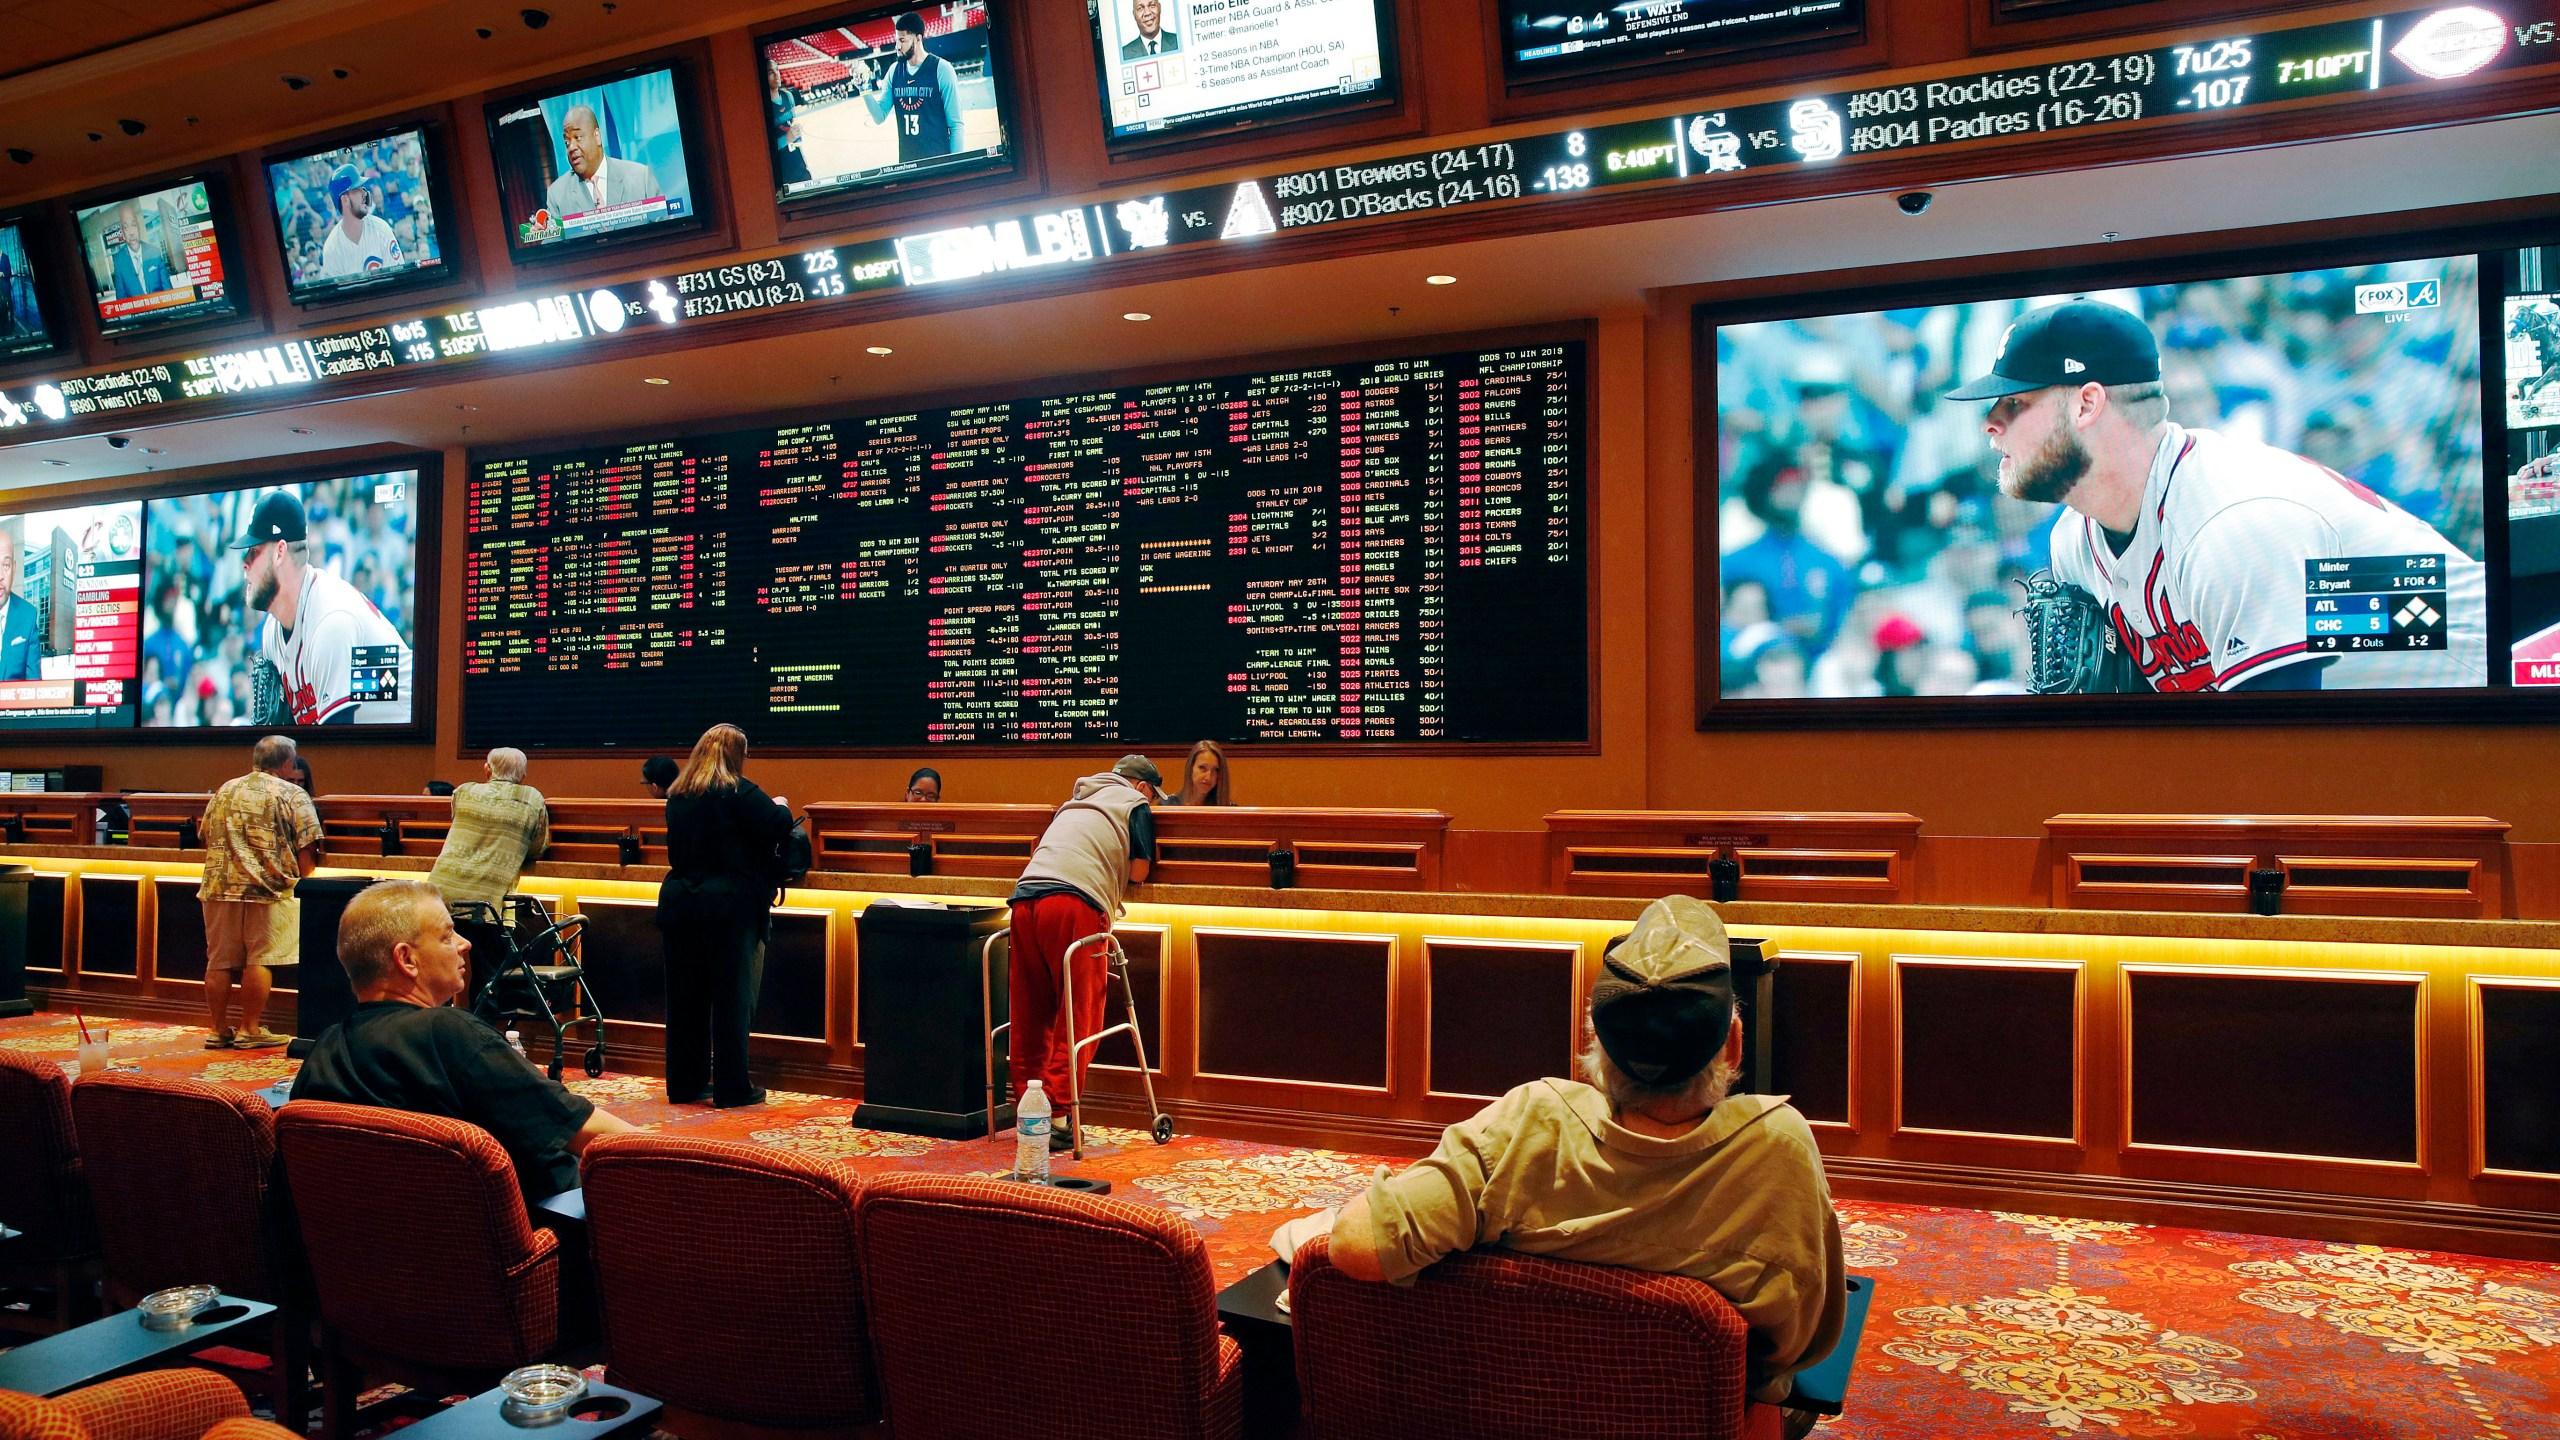 Sports_Betting_07605-159532.jpg89331353